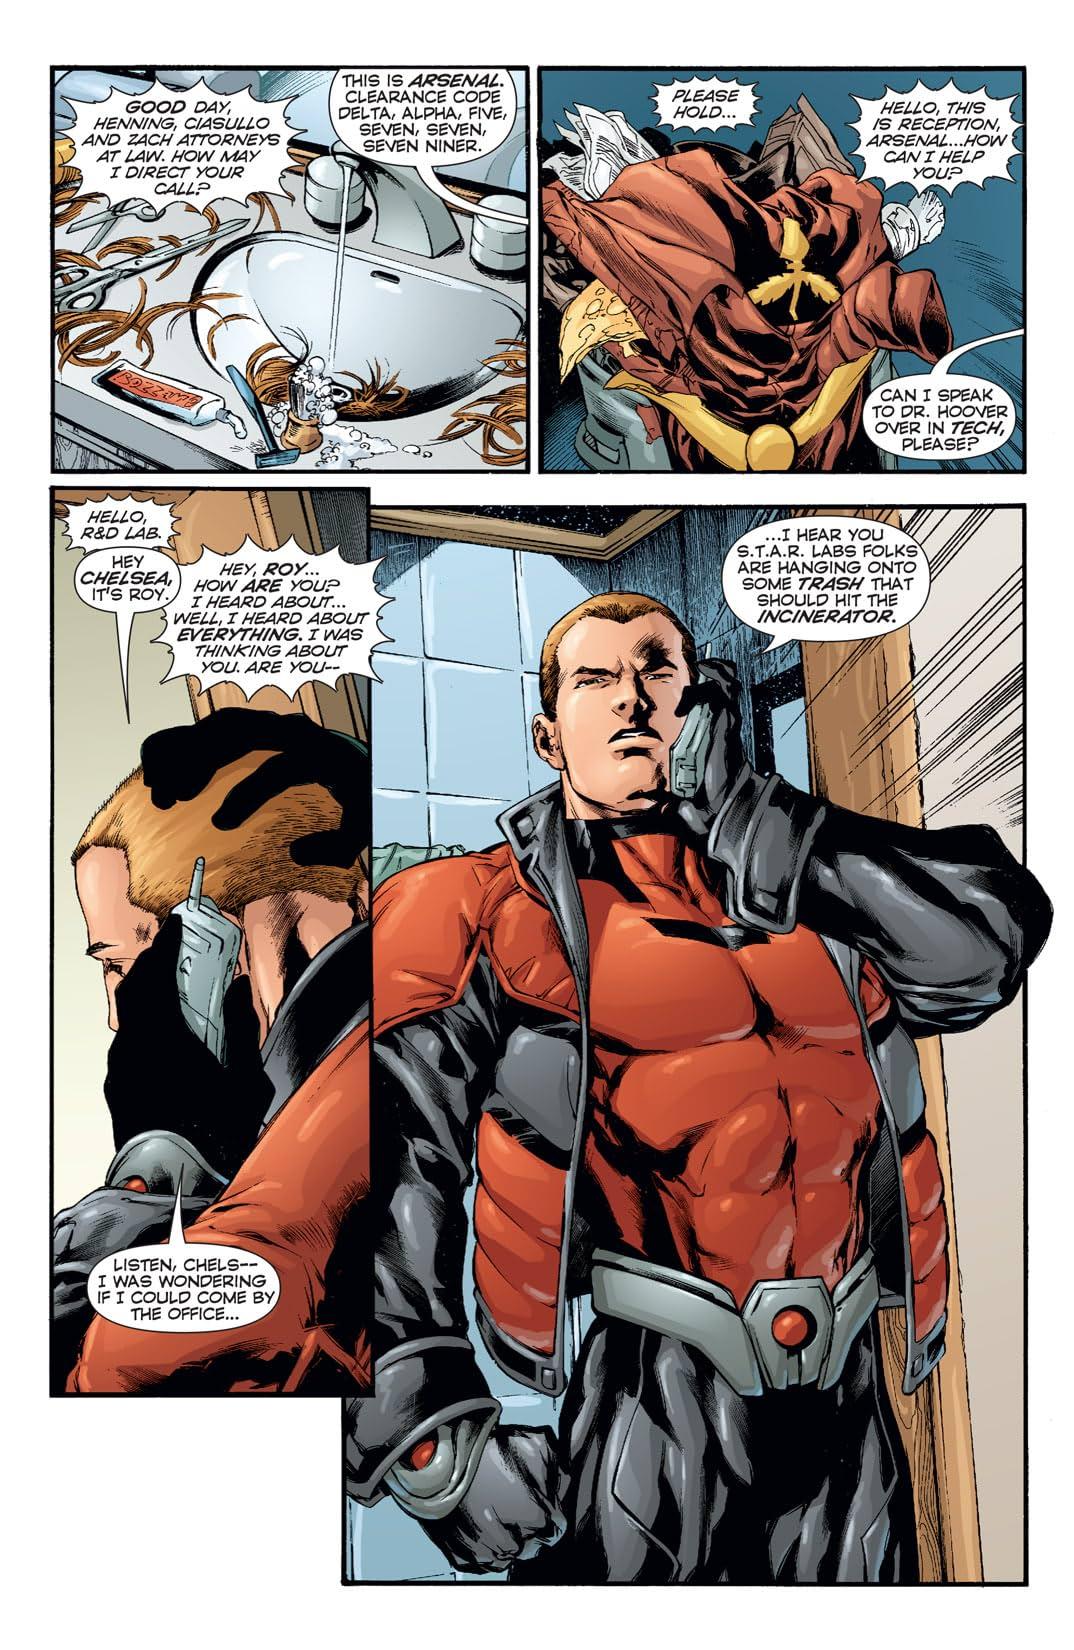 Teen Titans/Outsiders: Secret Files & Origins (2003) #1